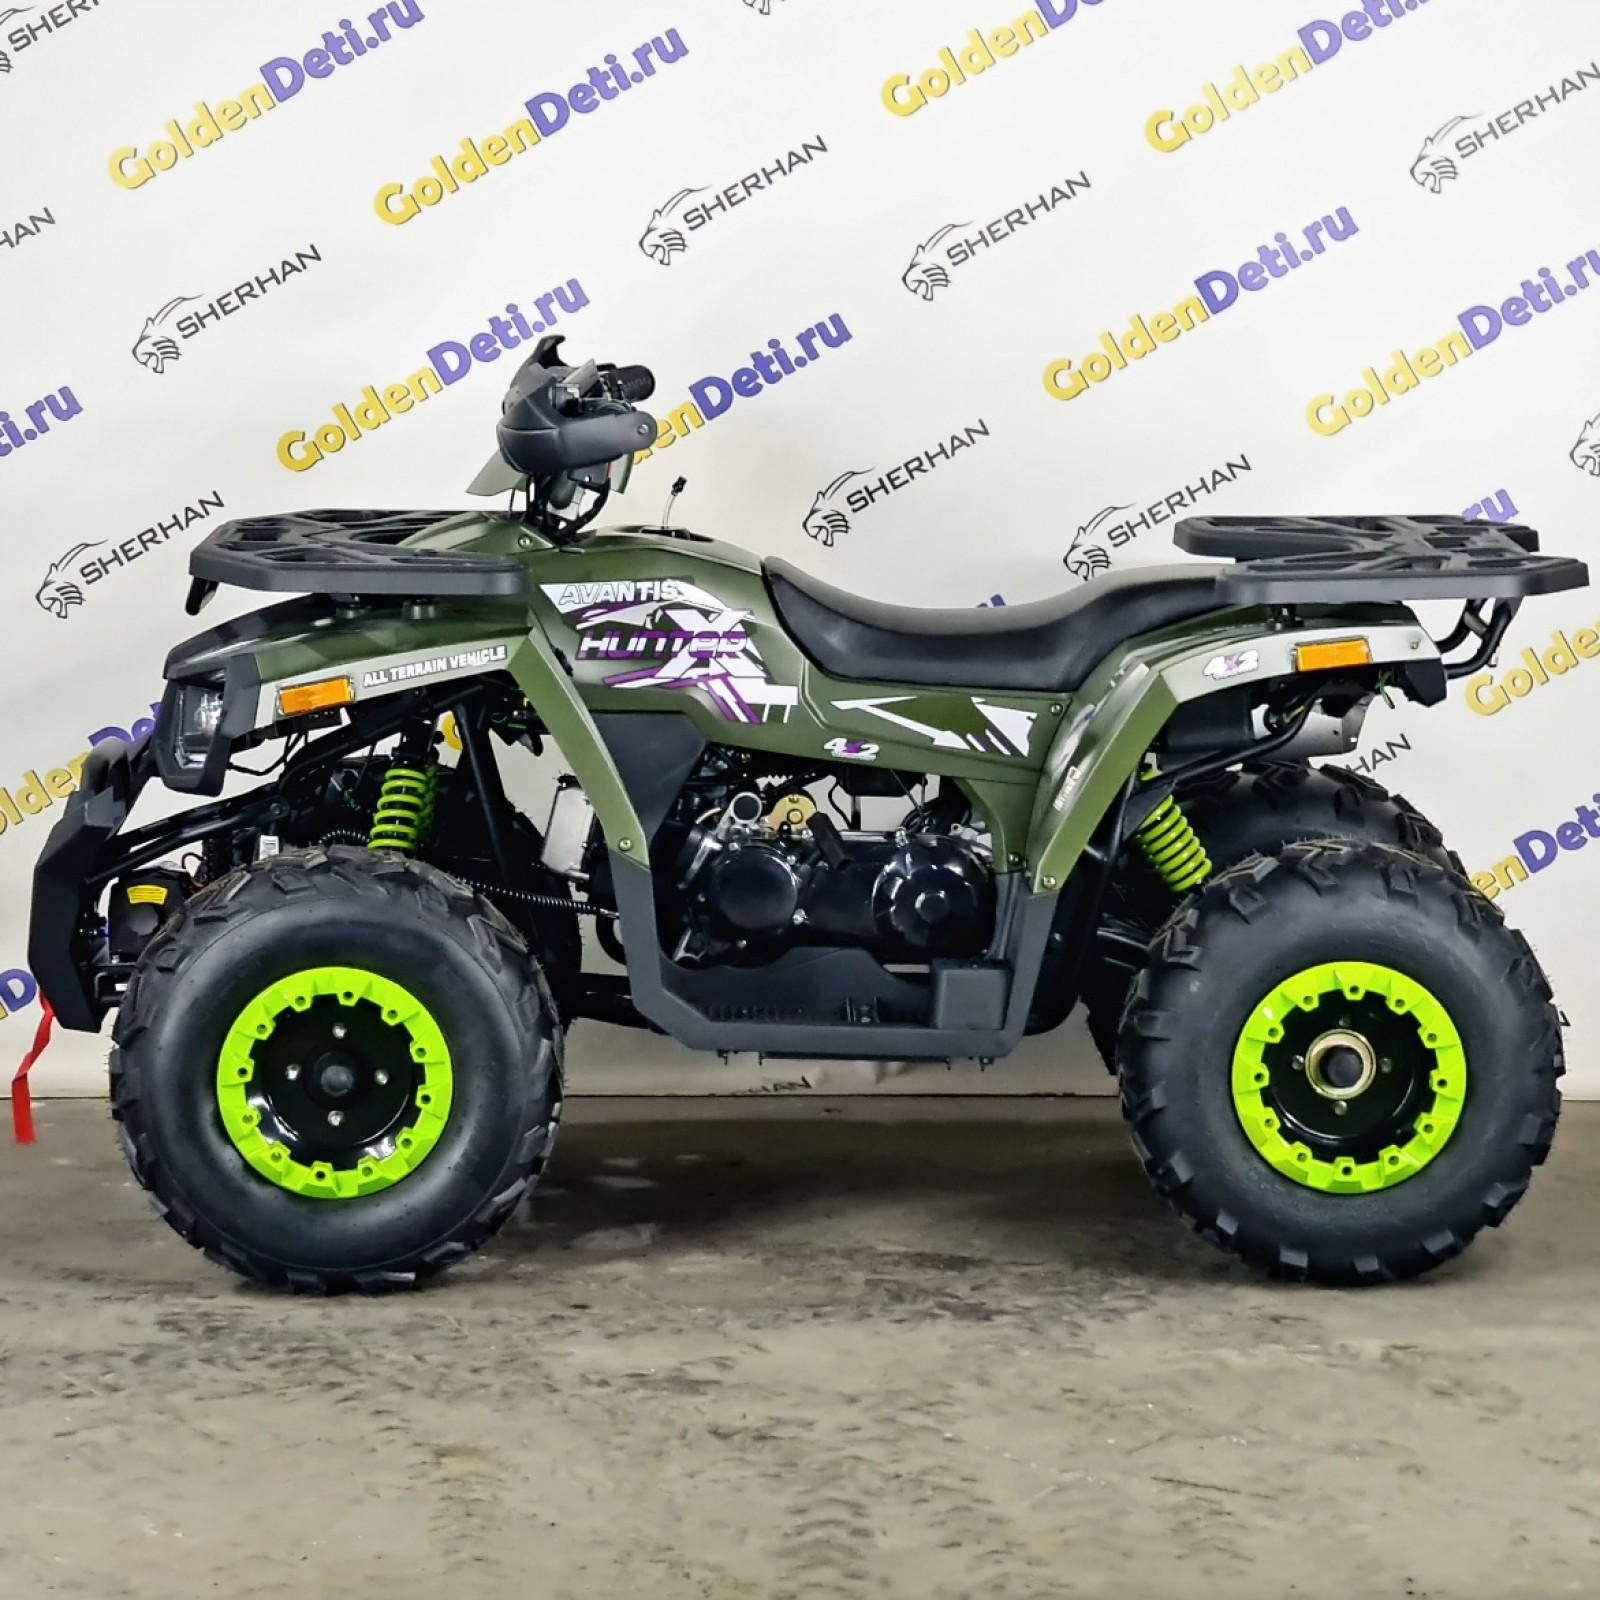 Квадроцикл Avantis Hunter 200 BIG LUX 2020 года